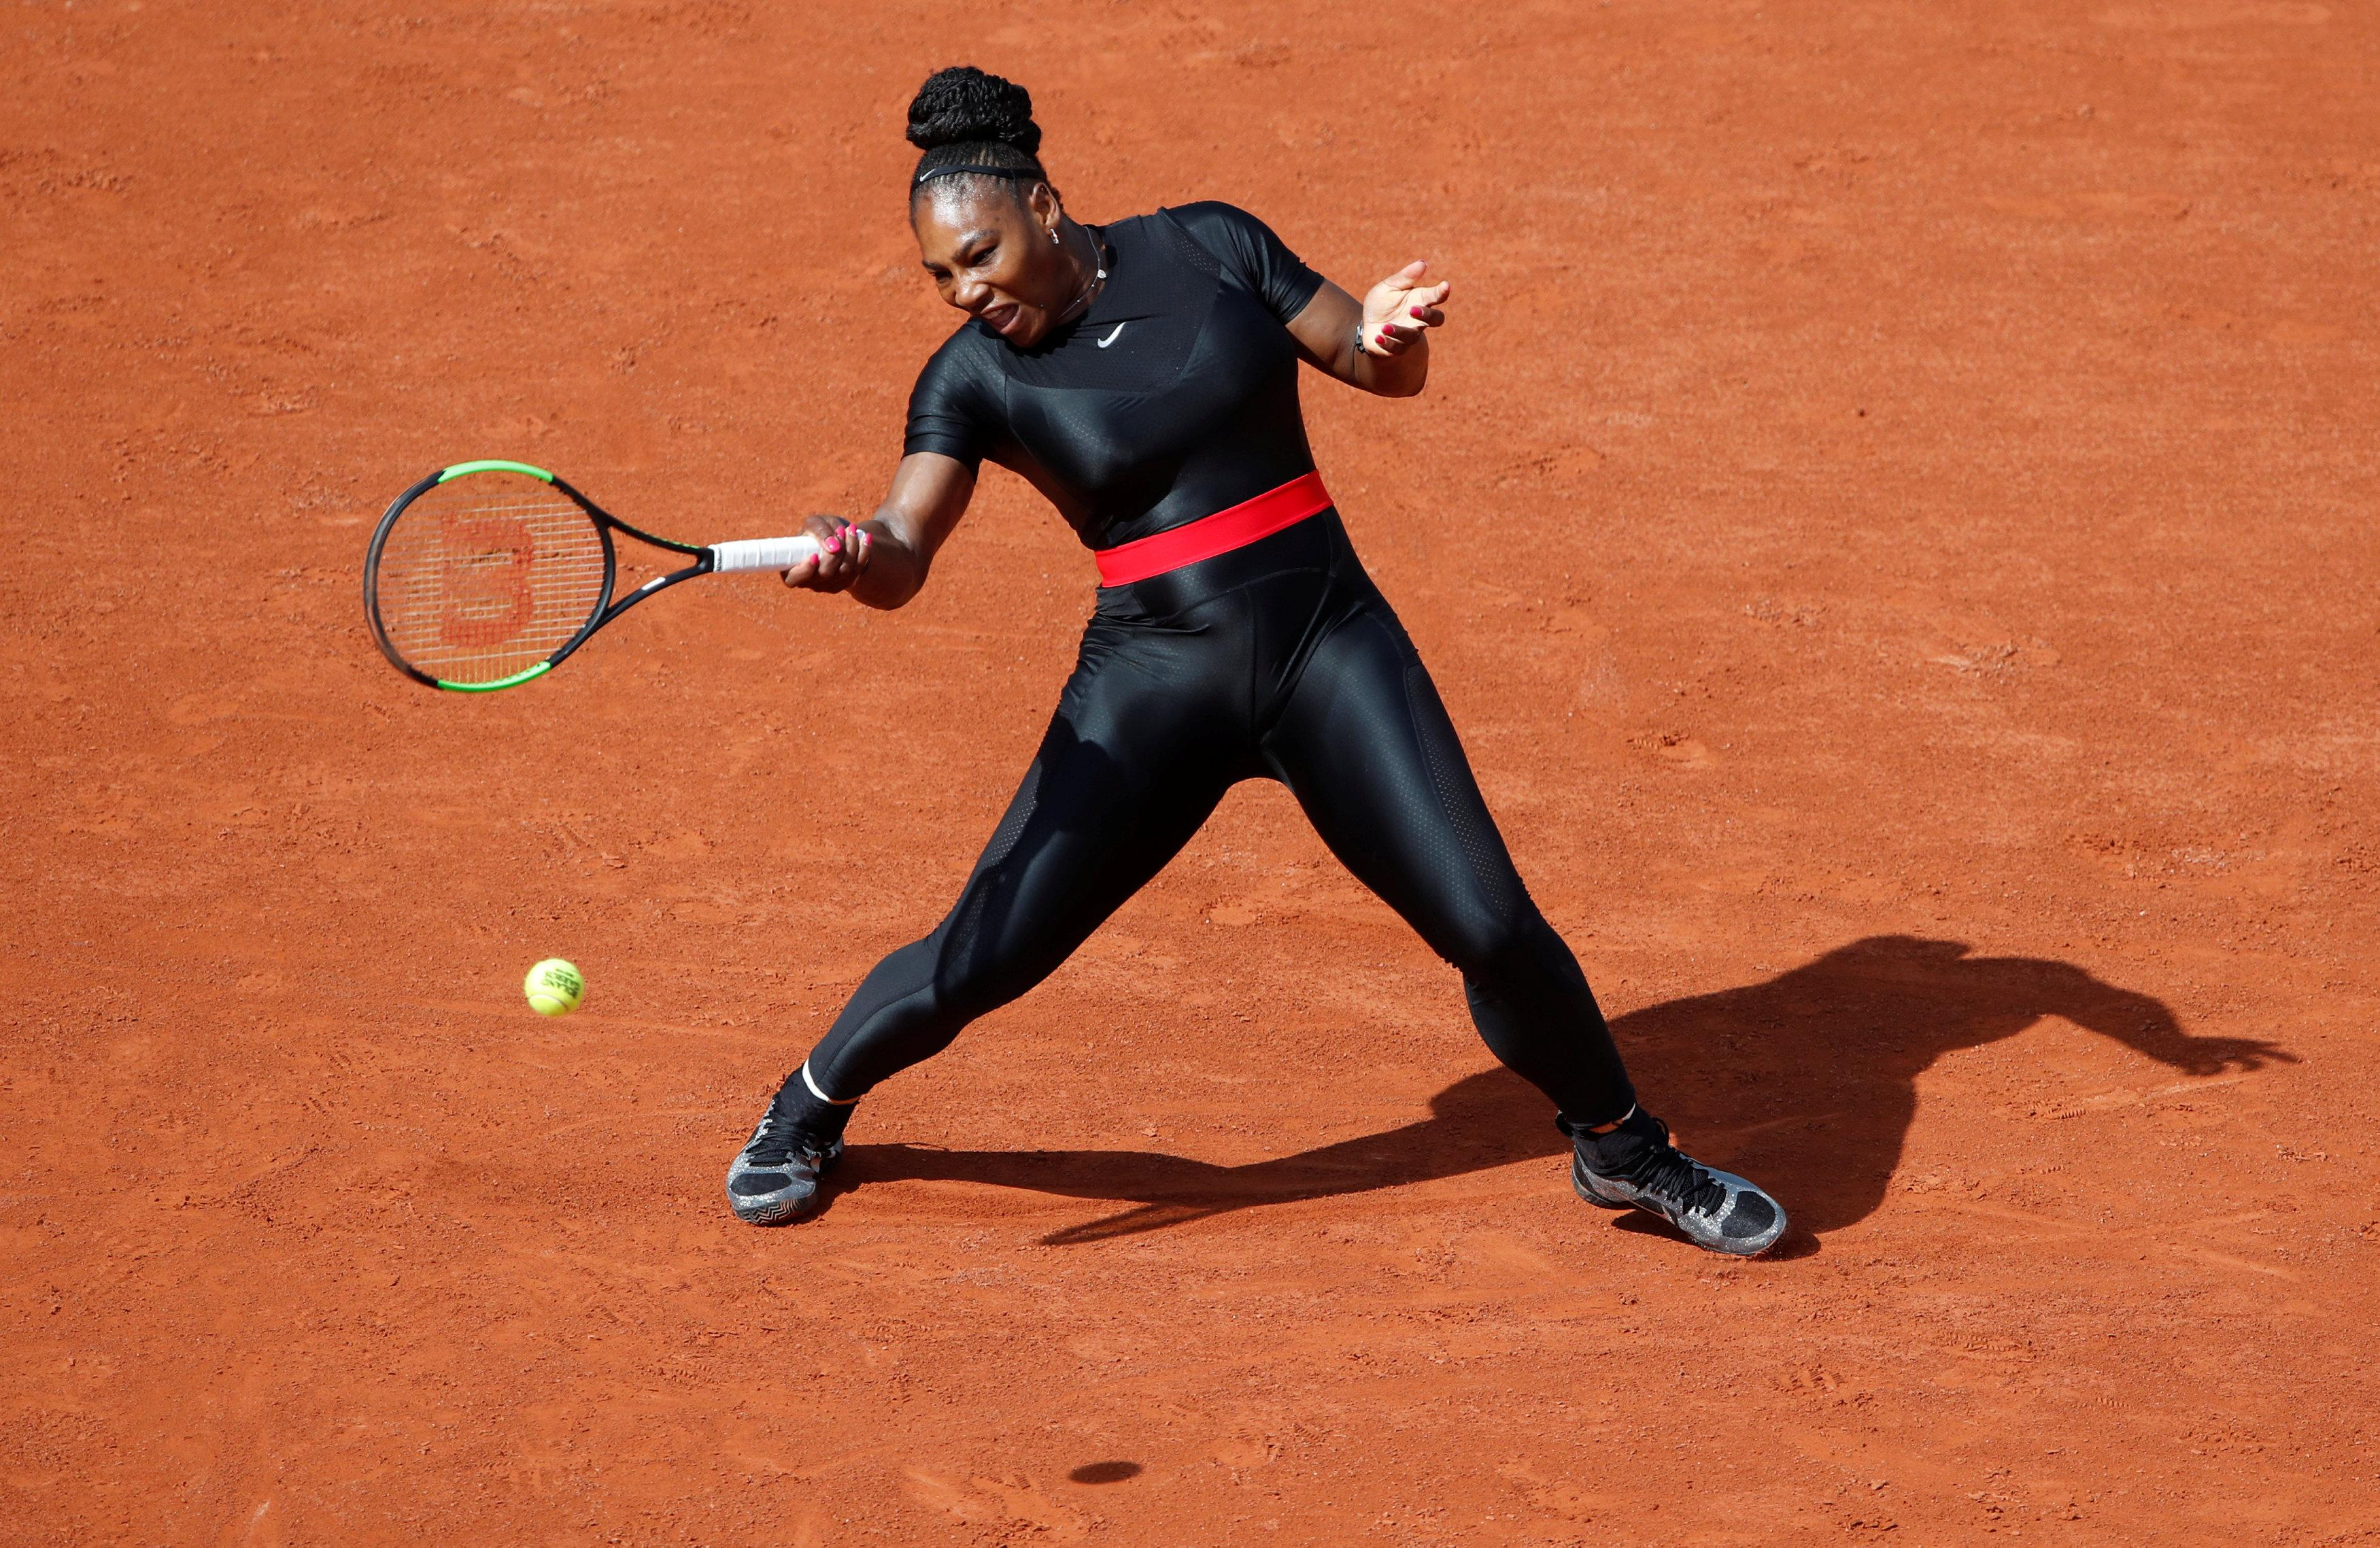 802a6cadc5ac Serena Williams returns to tennis dressed like a superhero  Video